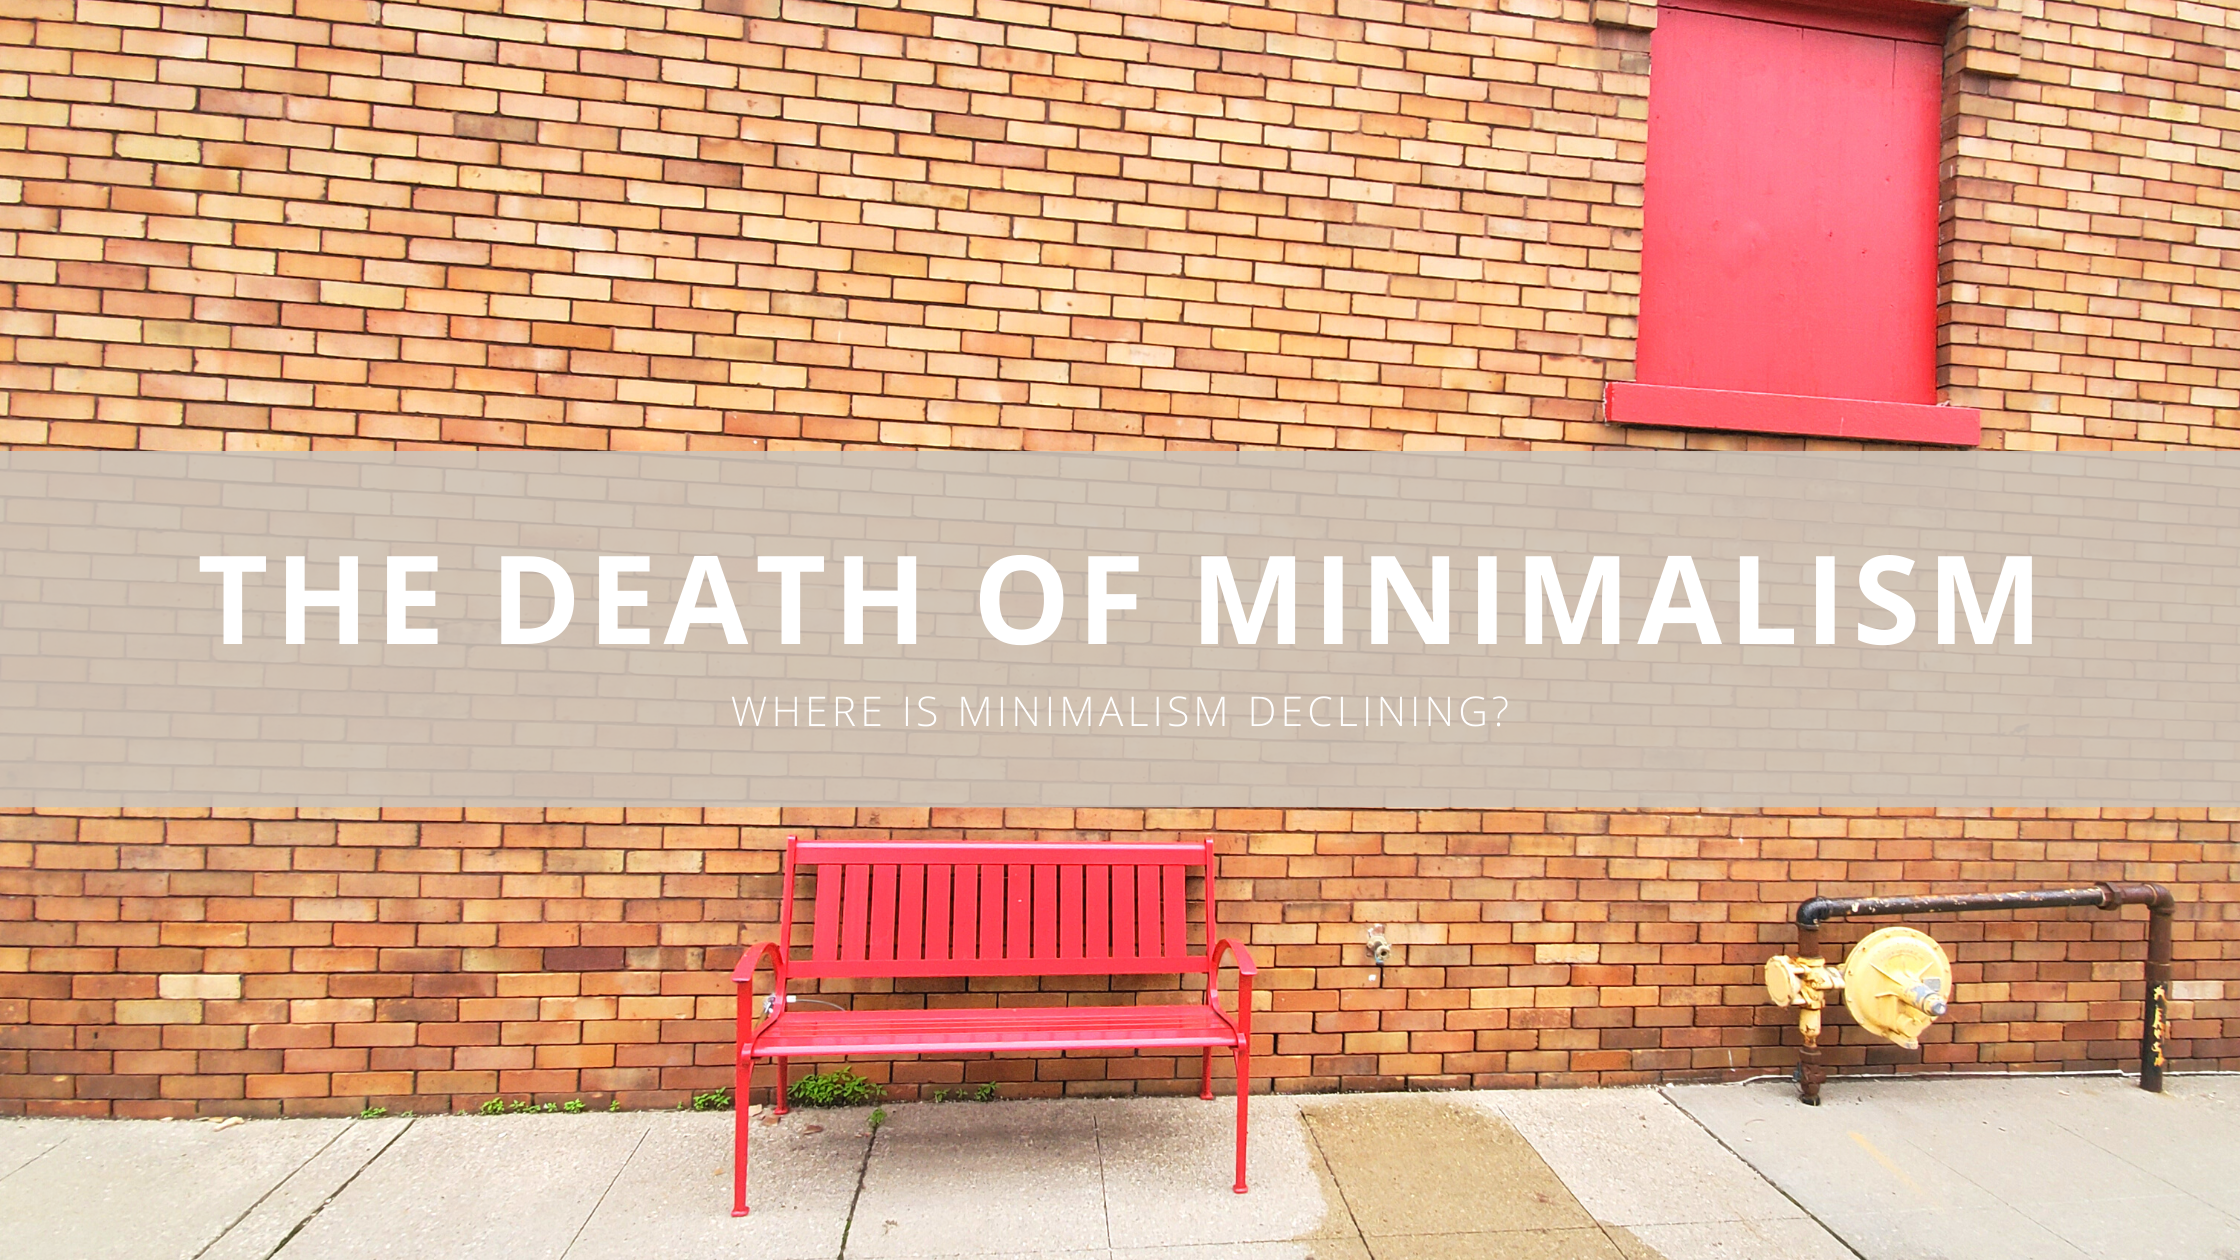 The Death of Minimalism